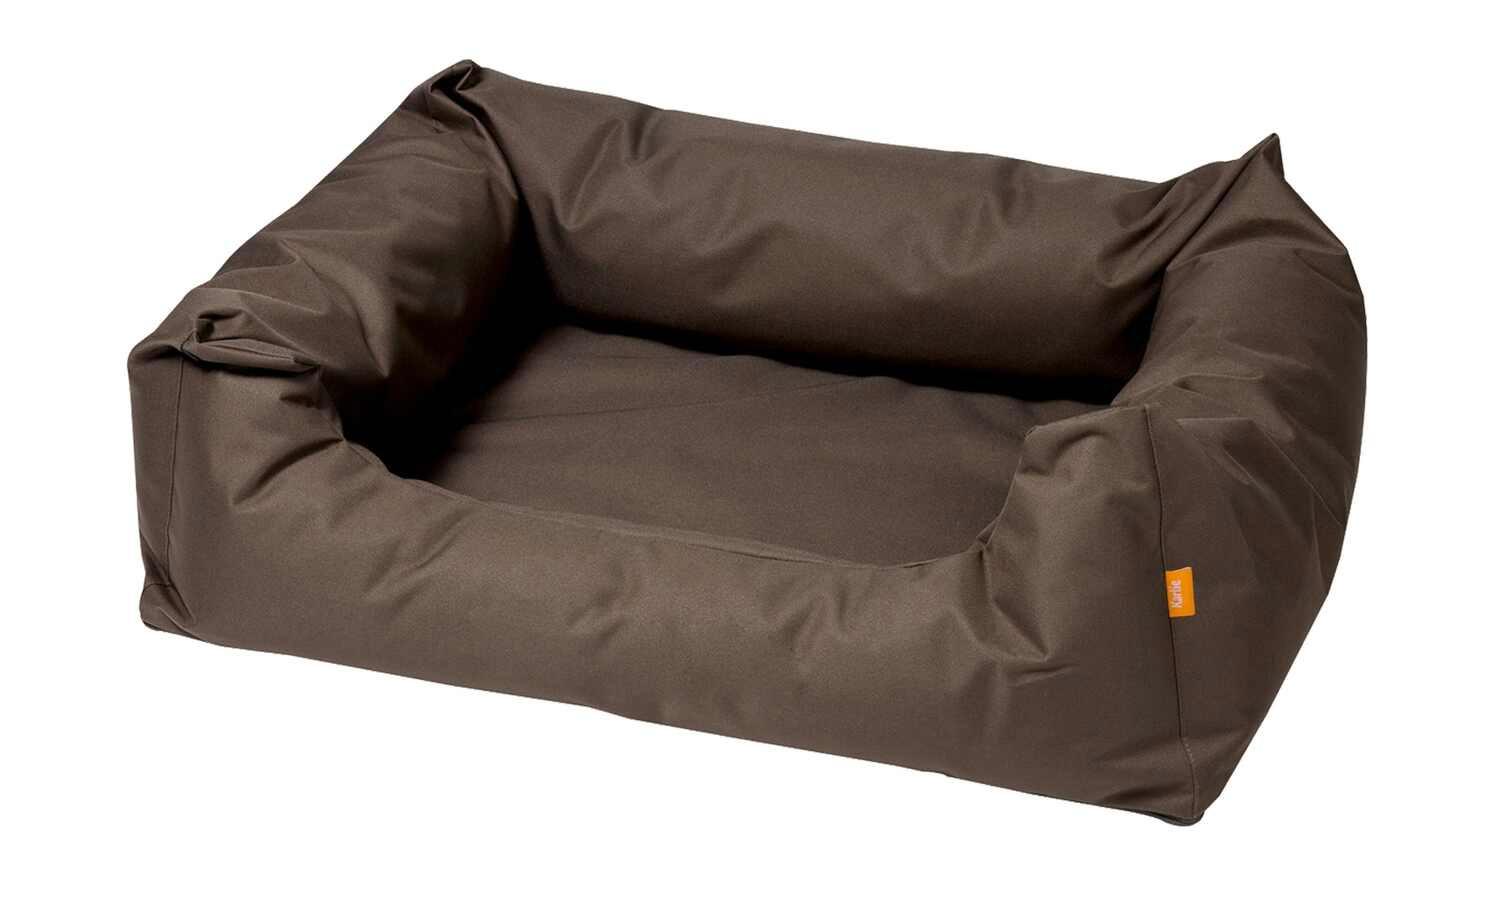 Hundebett / Hundekissen Flamingo Dreambay 80x67cm dunkelbraun Bild 1